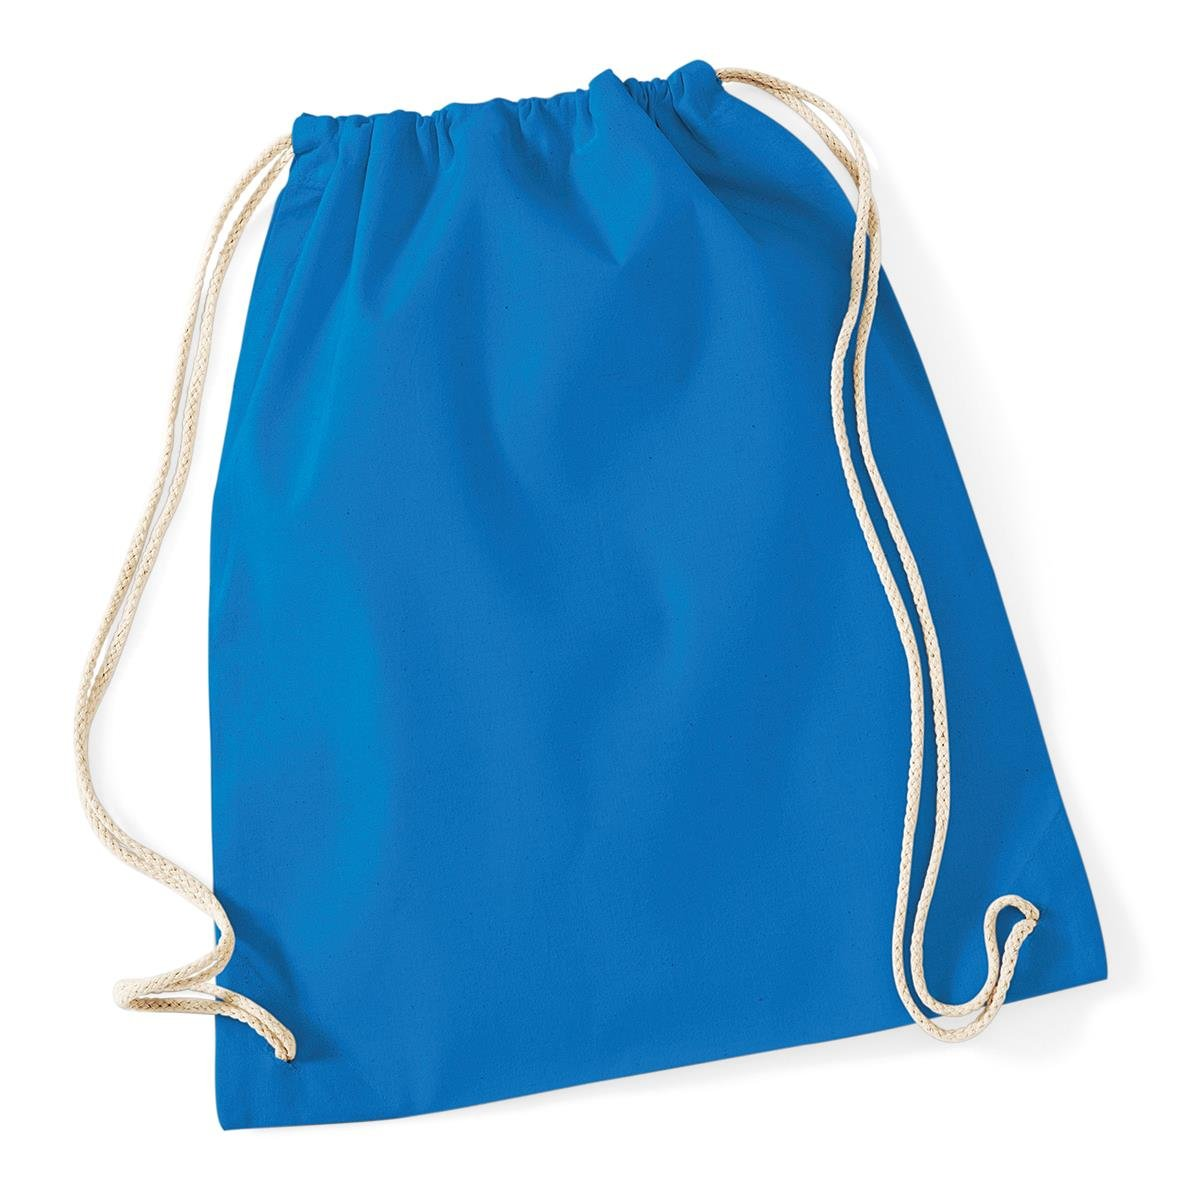 French Navy Westford Mill Cotton Lightweight Draw String Gym Sac Bag